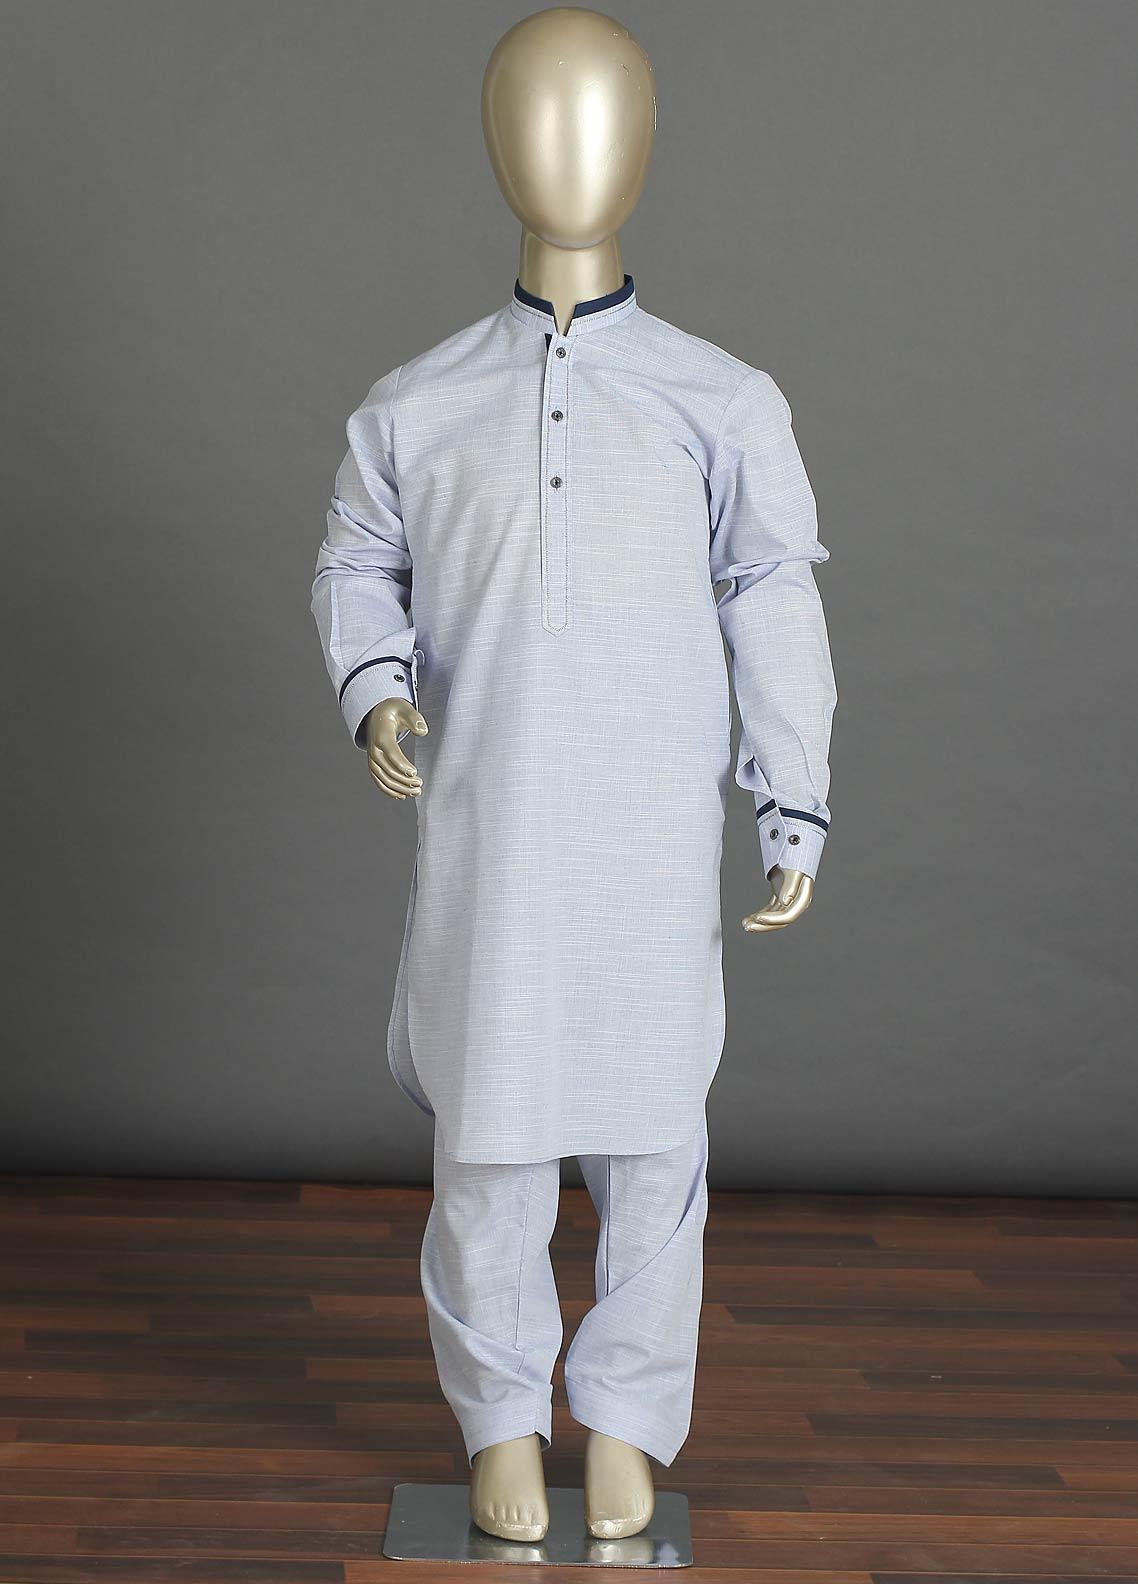 Aizaz Zafar Cotton Formal Boys Kameez Shalwar - 238 Sky Blue